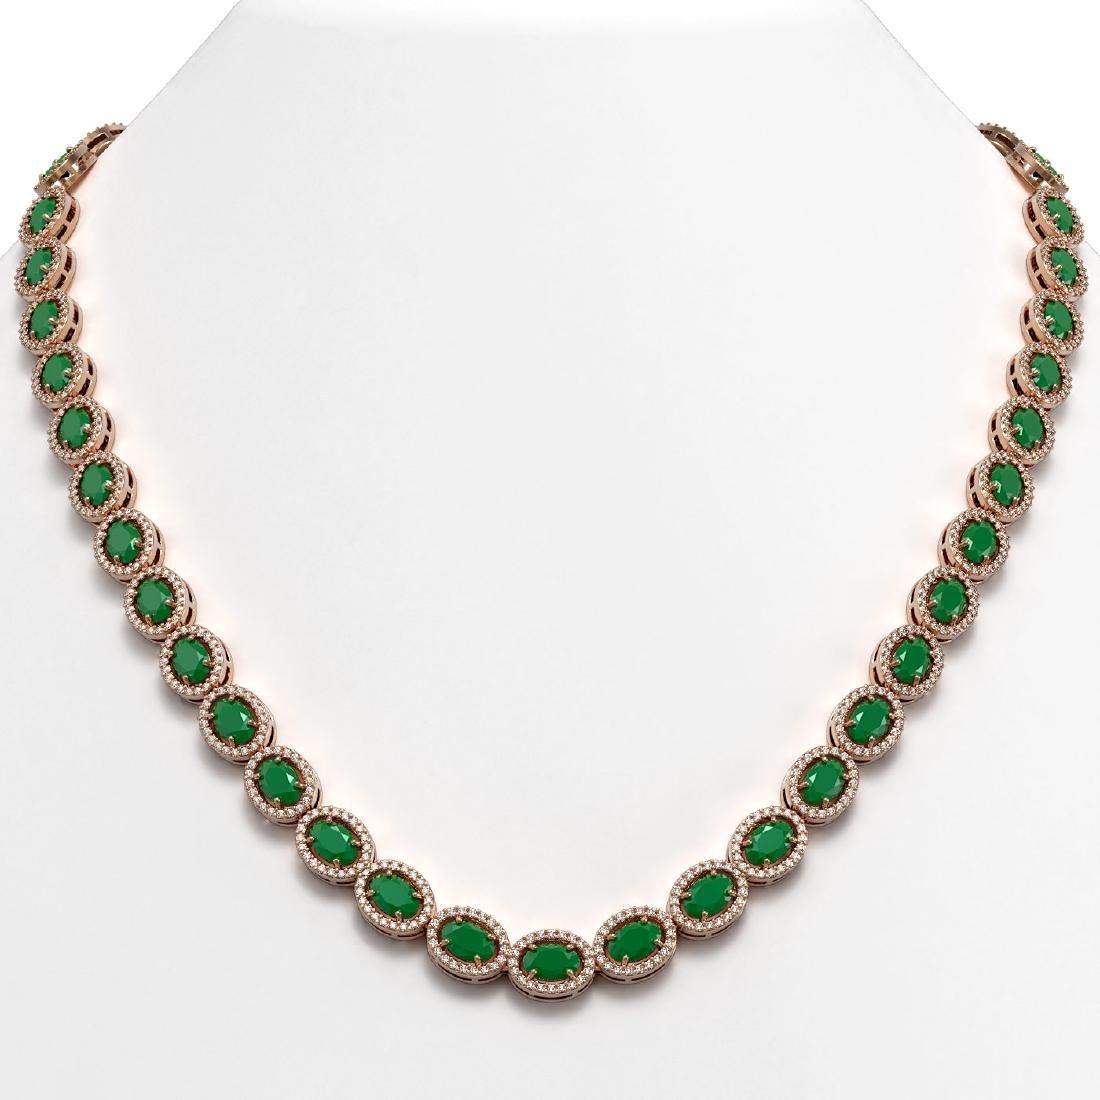 34.11 CTW Emerald & Diamond Halo Necklace 10K Rose Gold